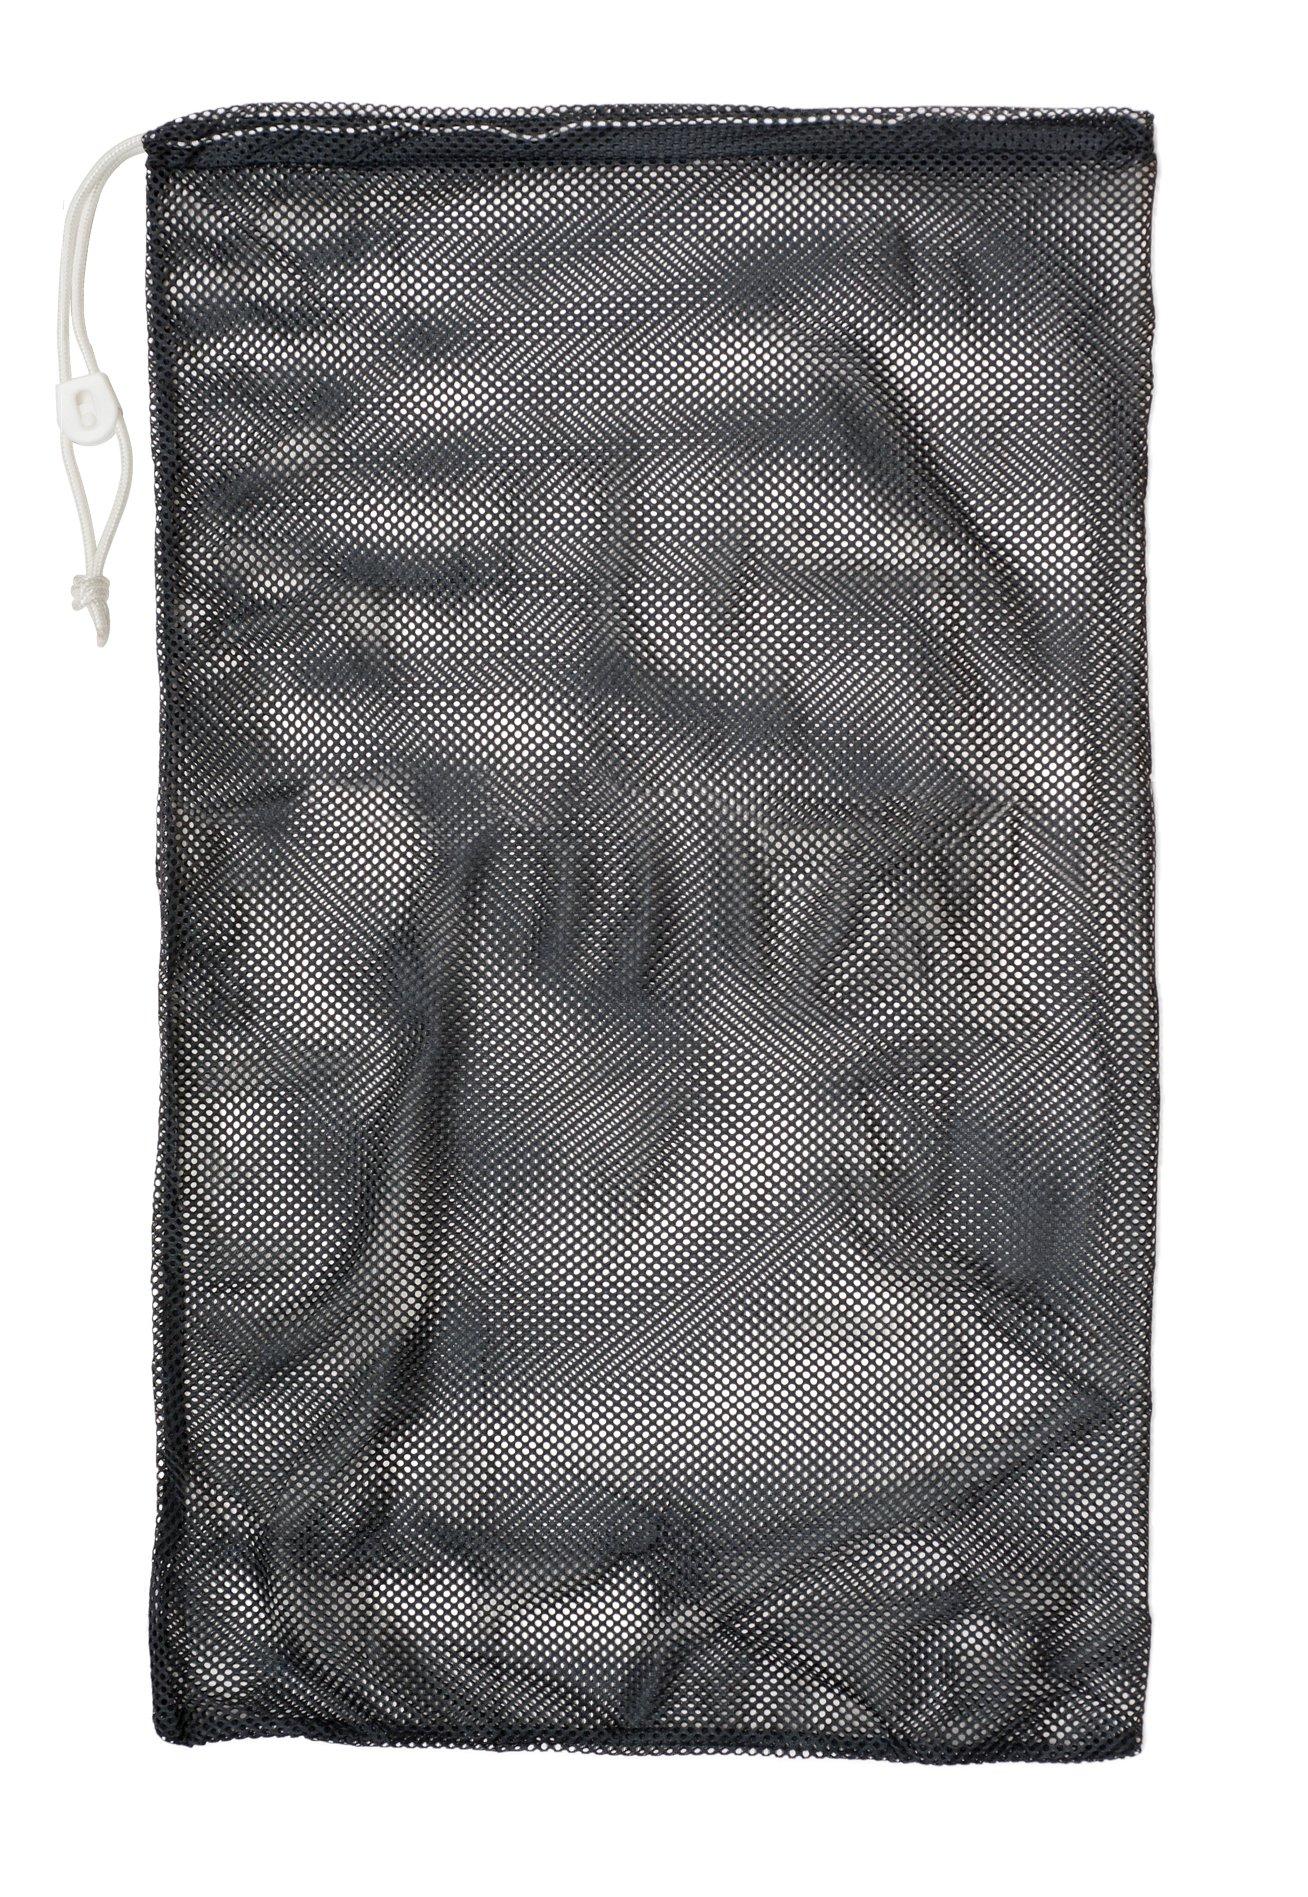 Champion Sports Mesh Equipment Bag, Black, 24'' x 36'' by Champion Sports (Image #1)